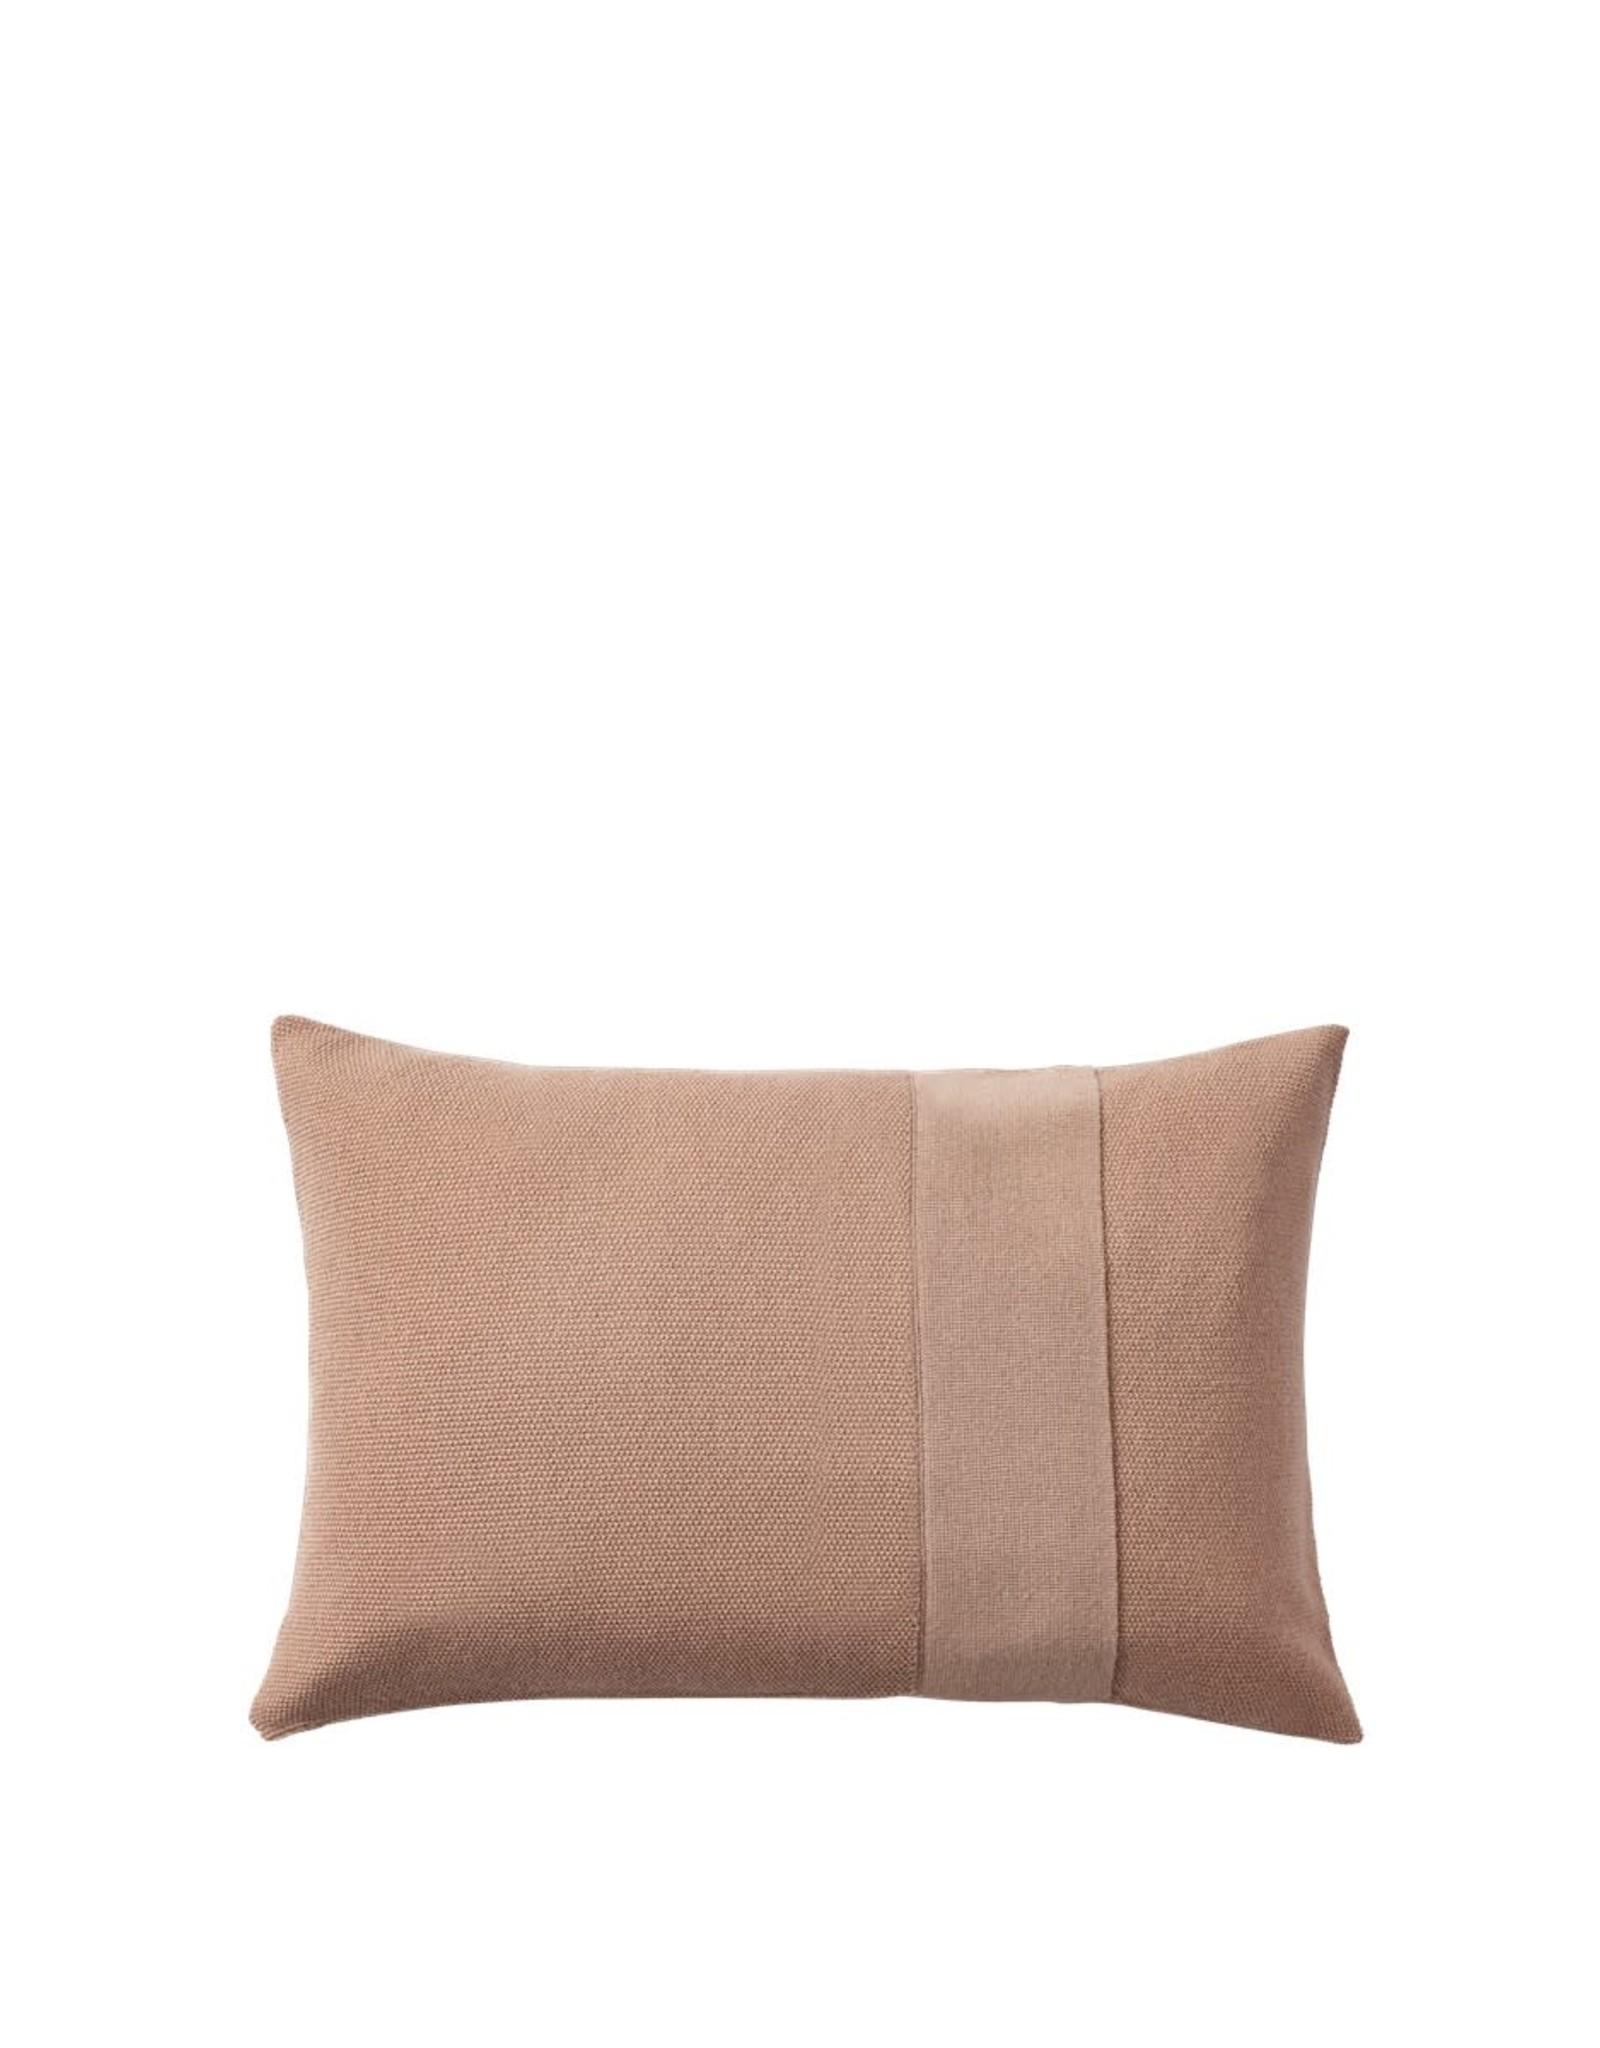 Muuto Muuto Layer Cushion 40x60 dusty rose